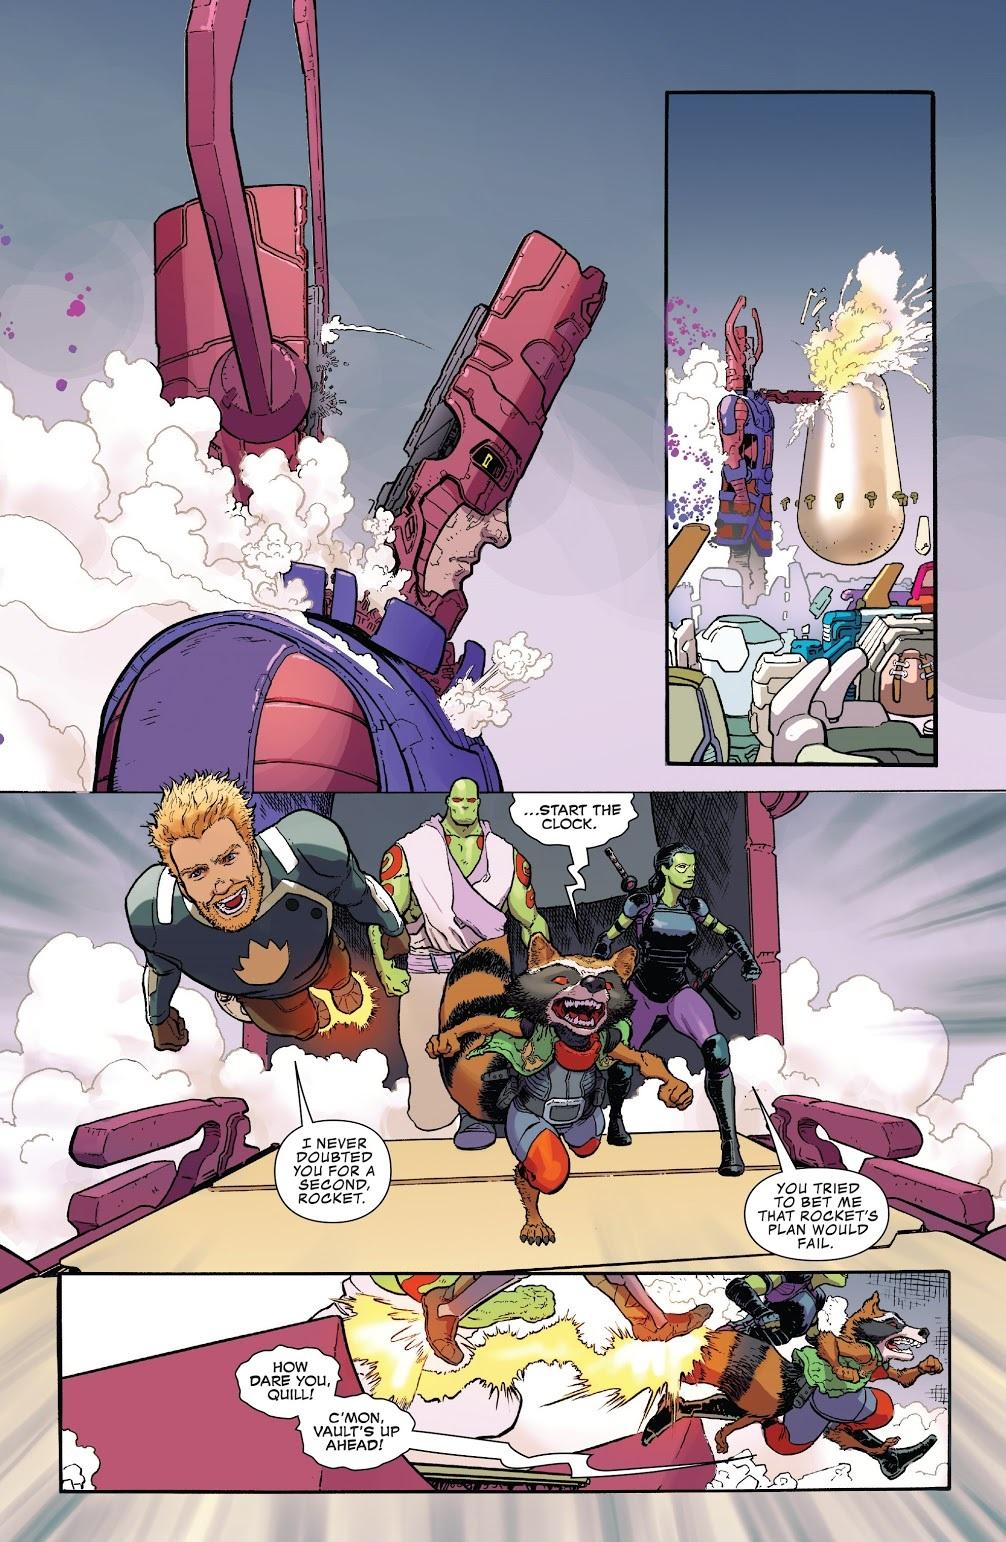 Открытия 2017— комиксы: Star-Lord, Infamous Iron Man, Batman: The White Knight. - Изображение 4